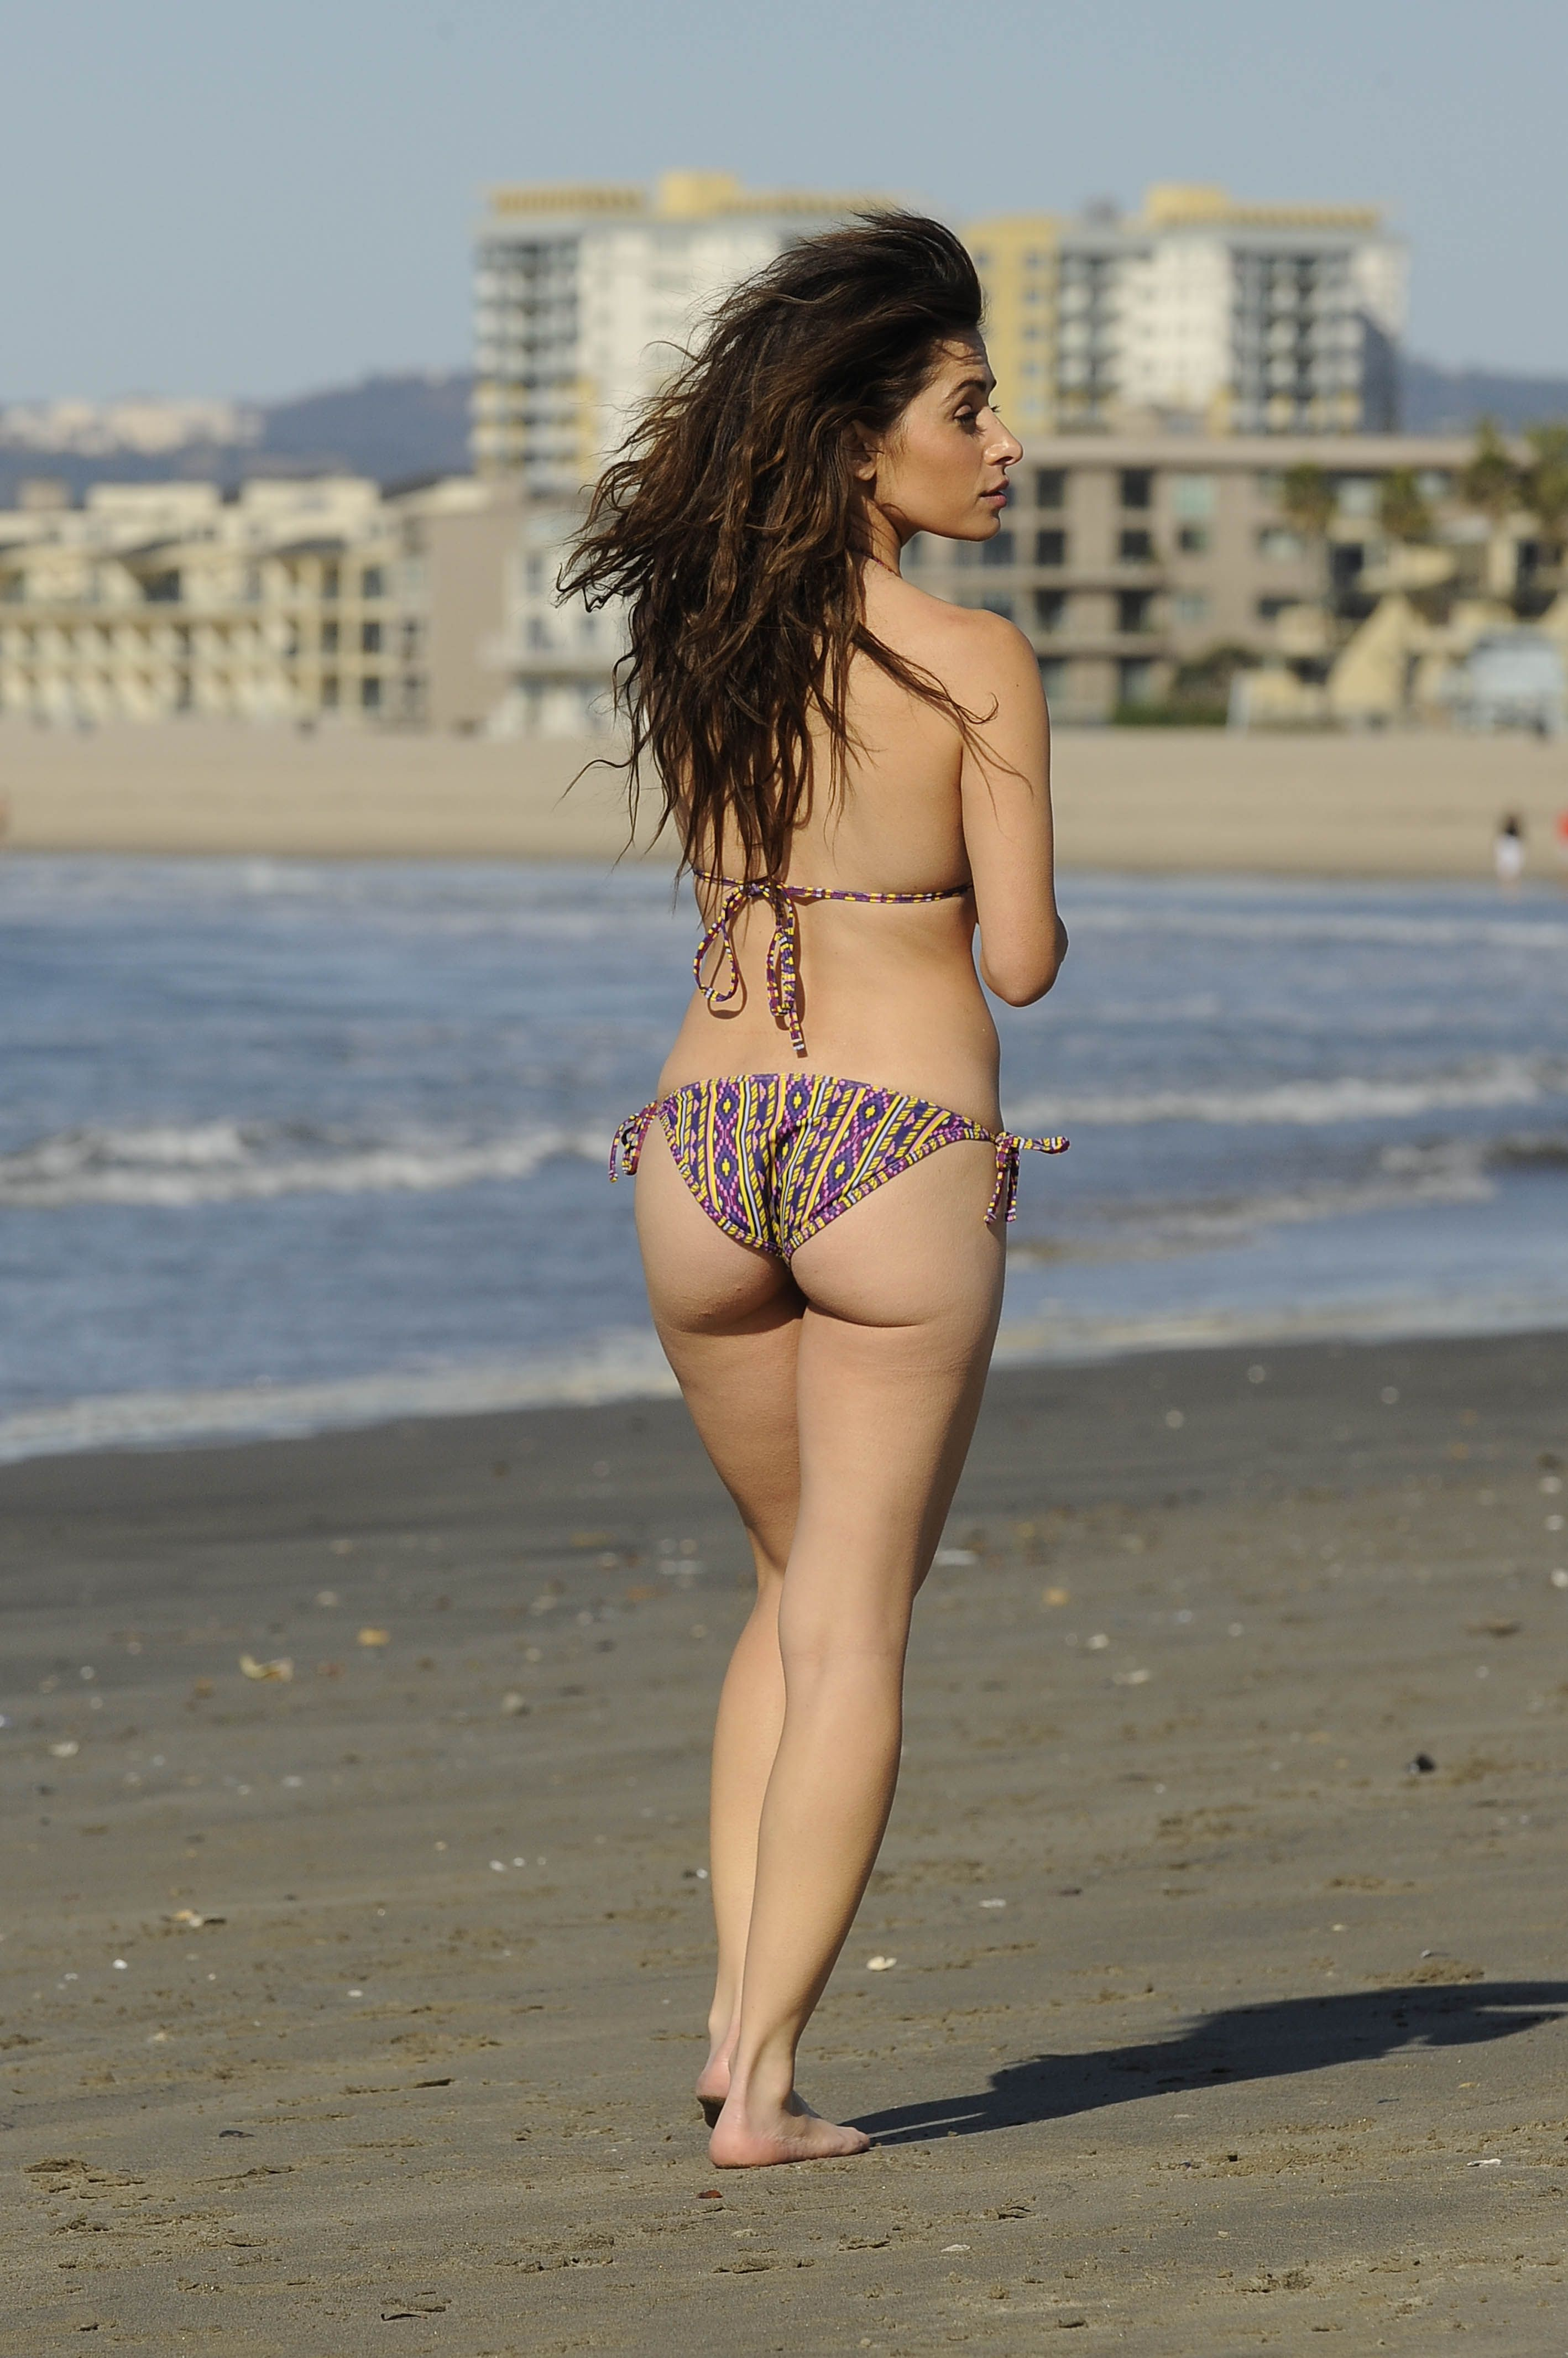 Amy Acker Bikini sarah shahi wow! jaw dropping in her much admired bikini